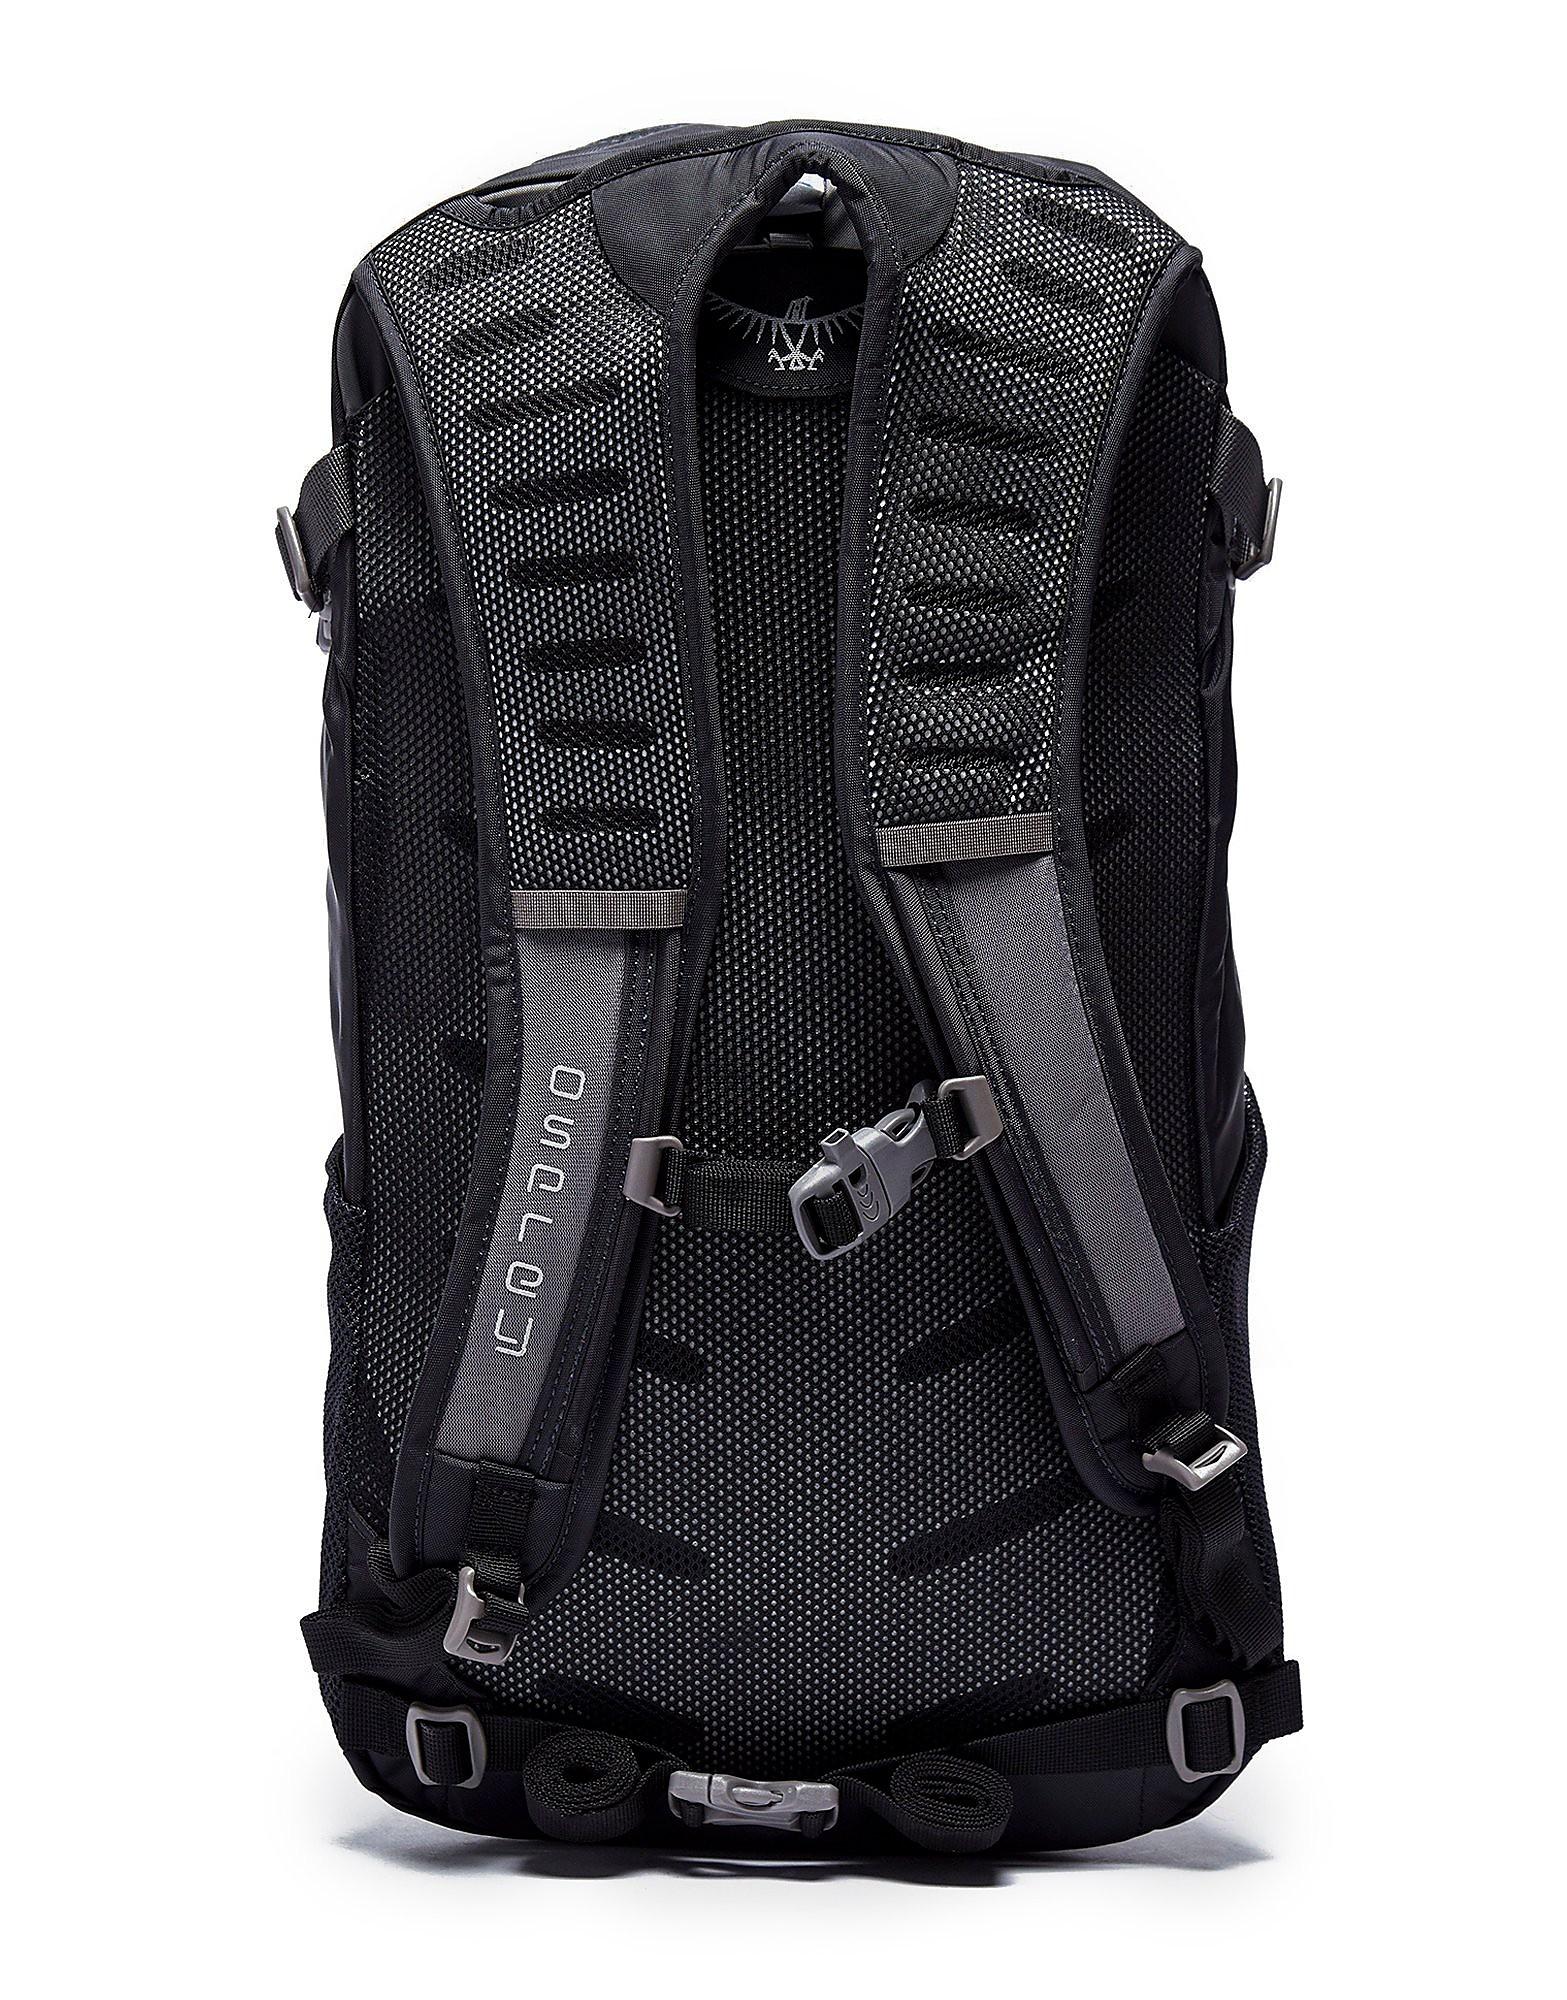 Osprey Daylite Plus 20 Backpack